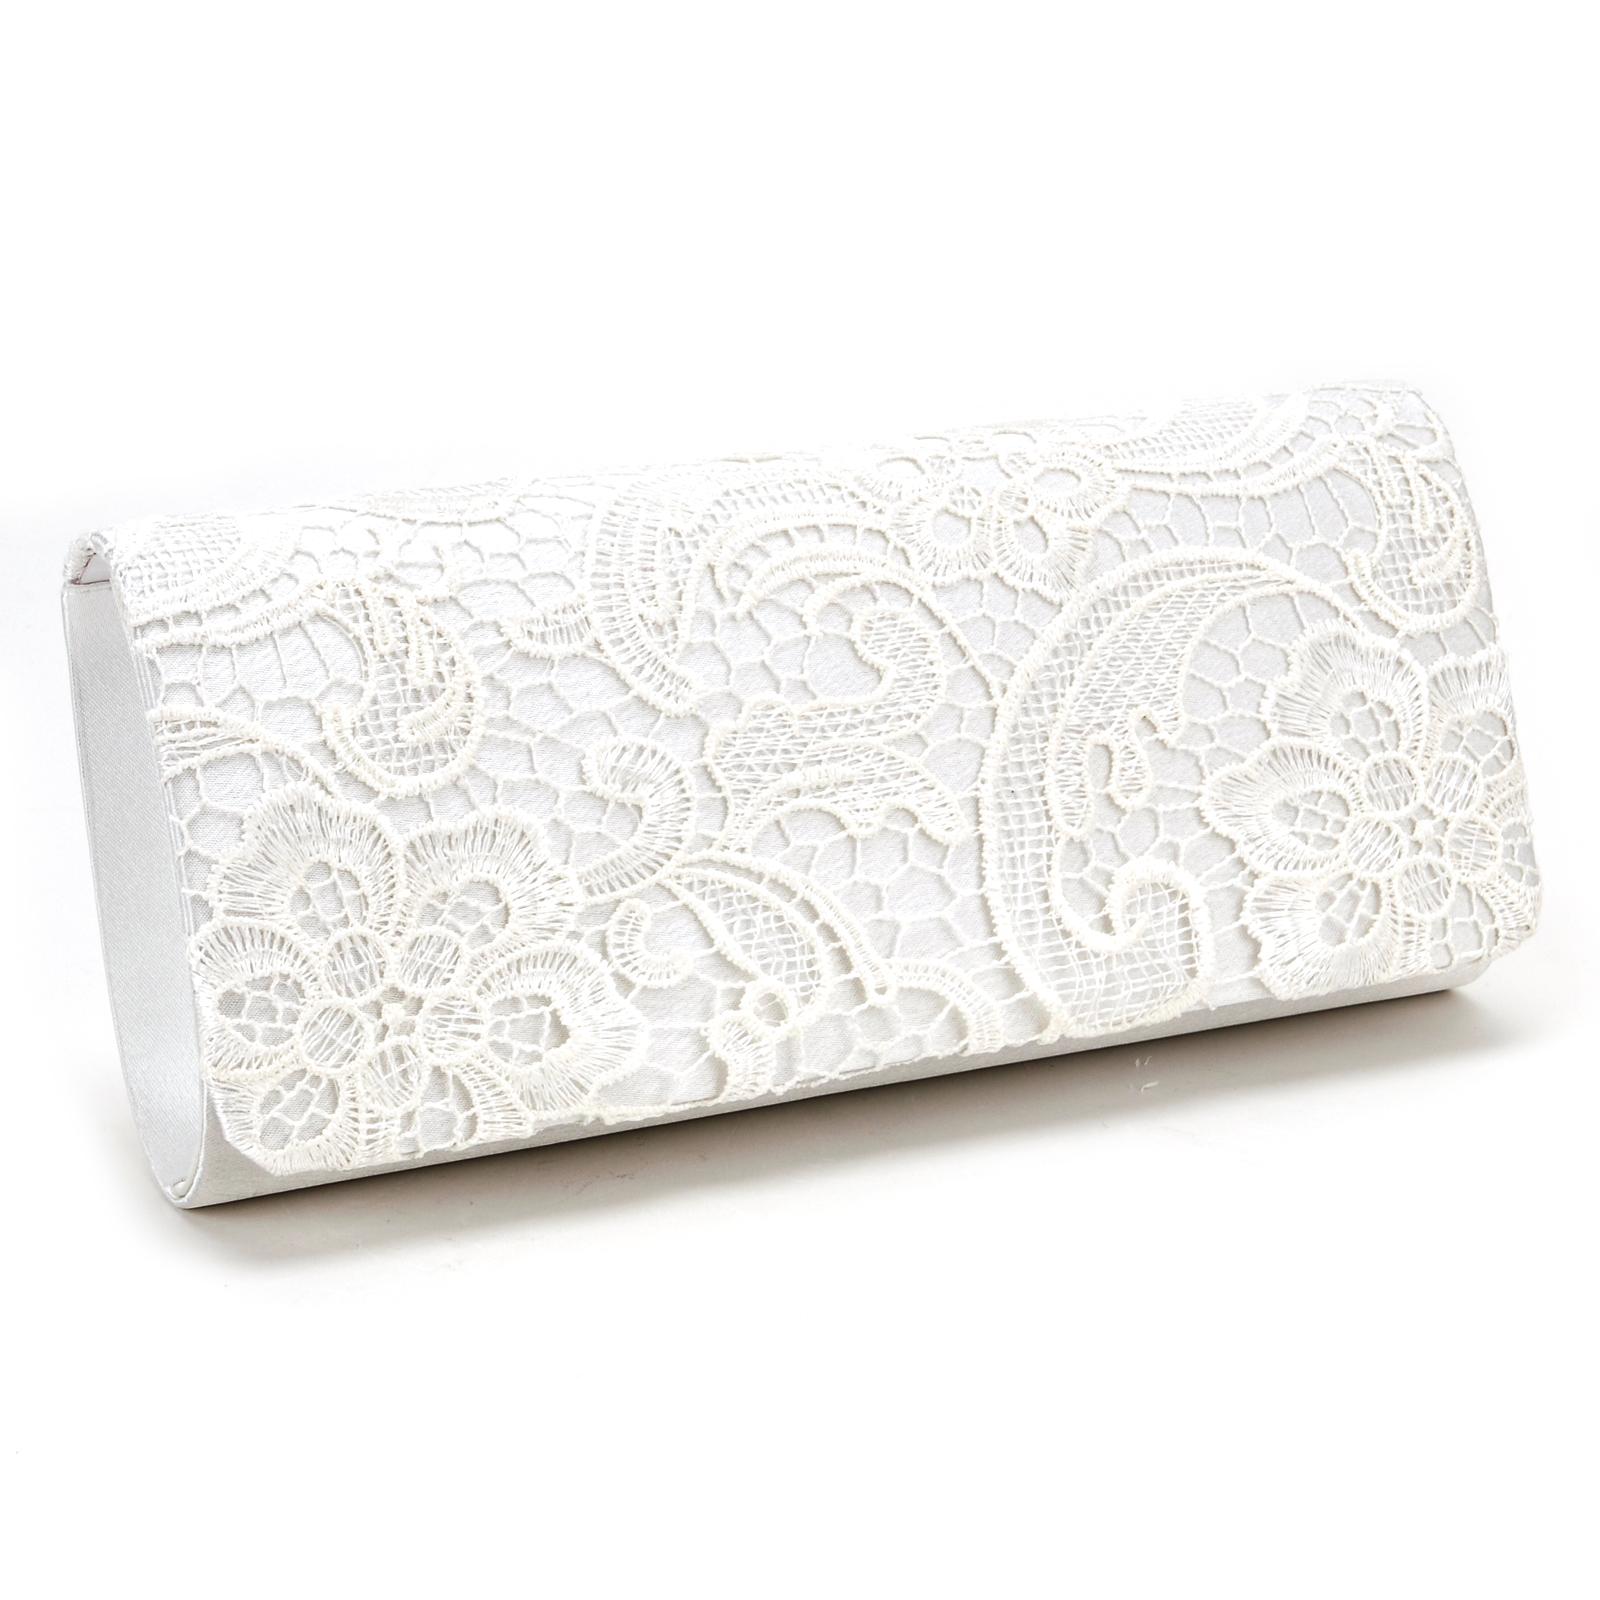 La S Lace Satin Evening Clutch Bag Envelope Handbag Prom